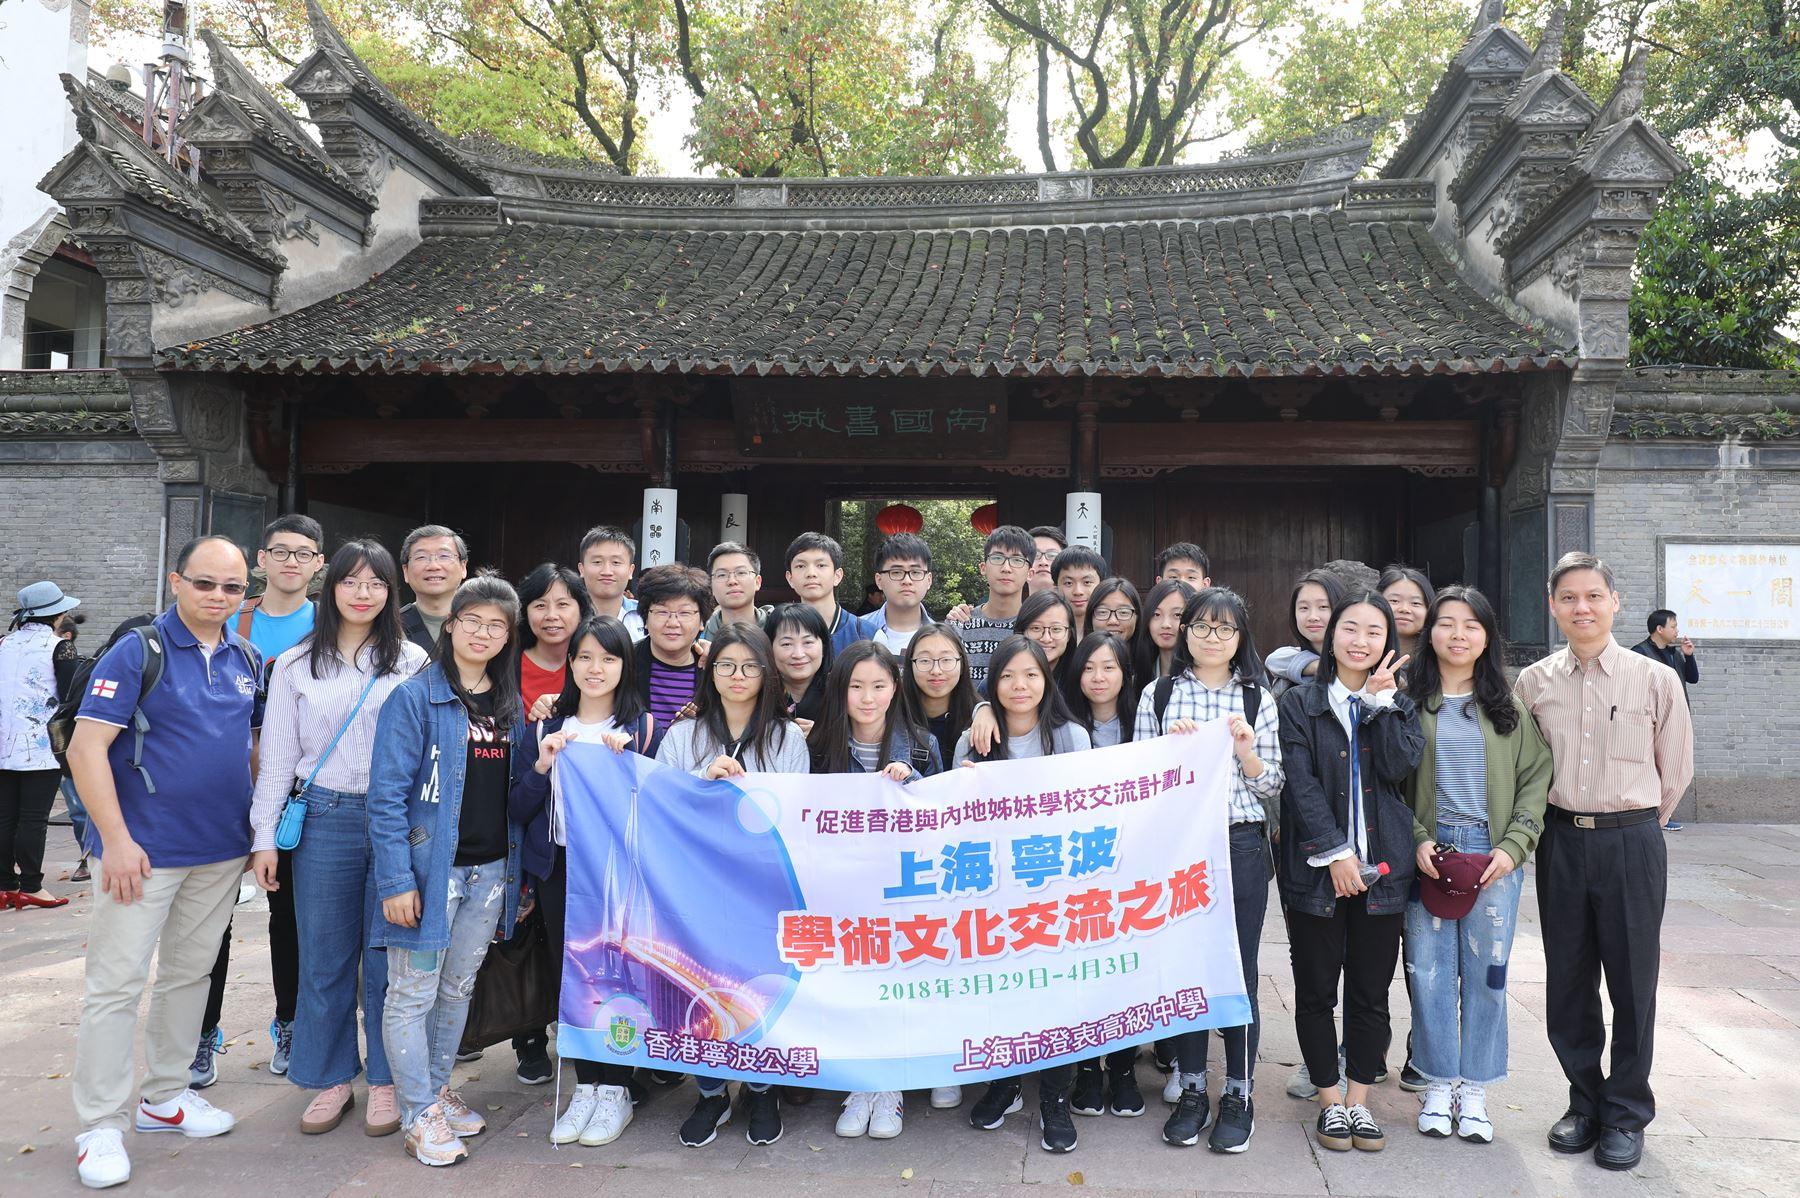 http://npc.edu.hk/sites/default/files/23_43.jpg